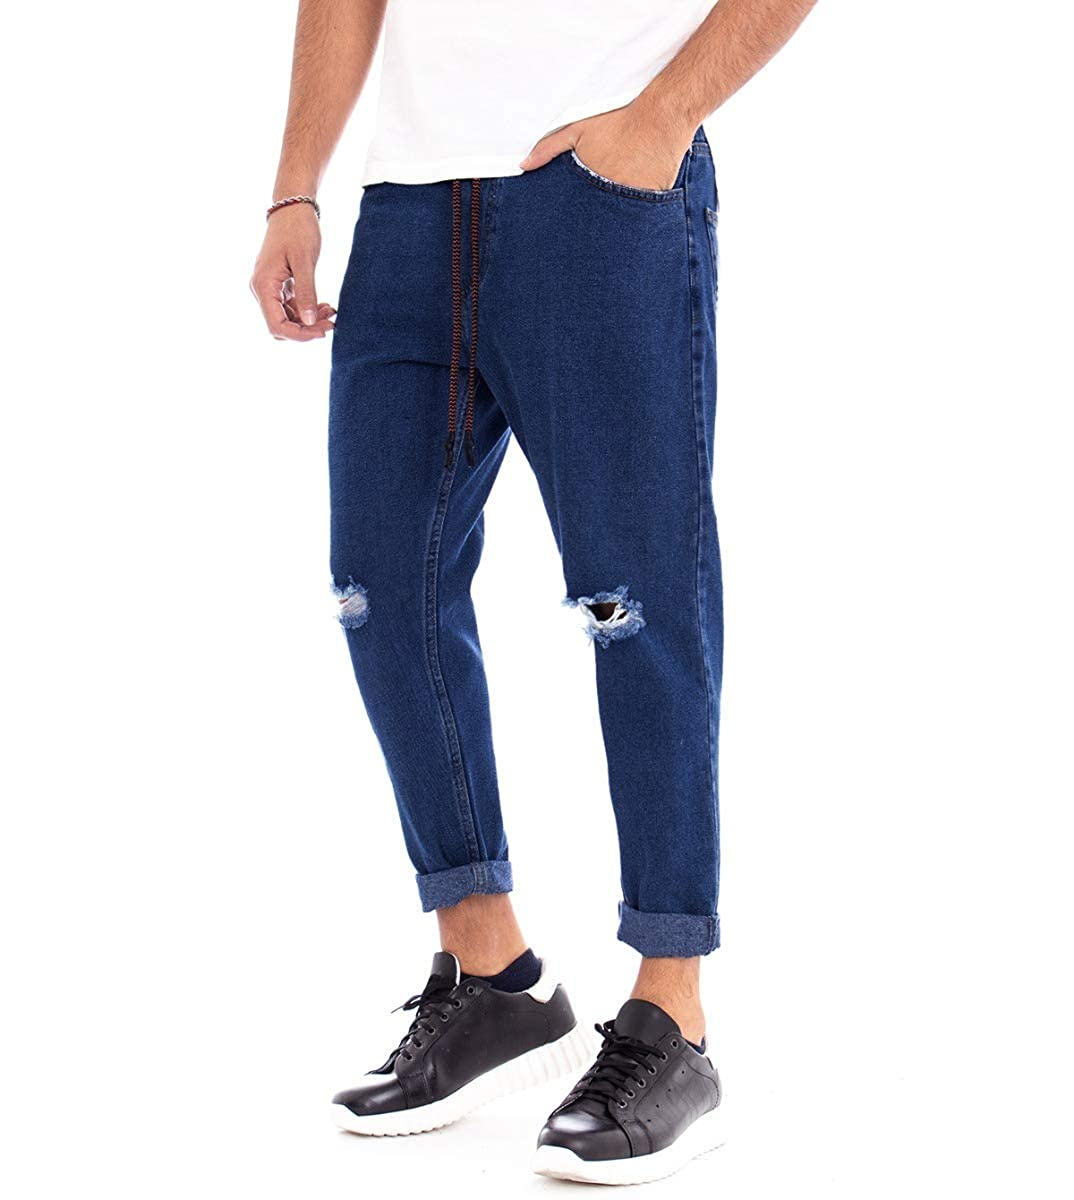 Pantalone Uomo Jeans Panta-tuta Denim Elastico Taglio Ginocchia Cavallo Basso...